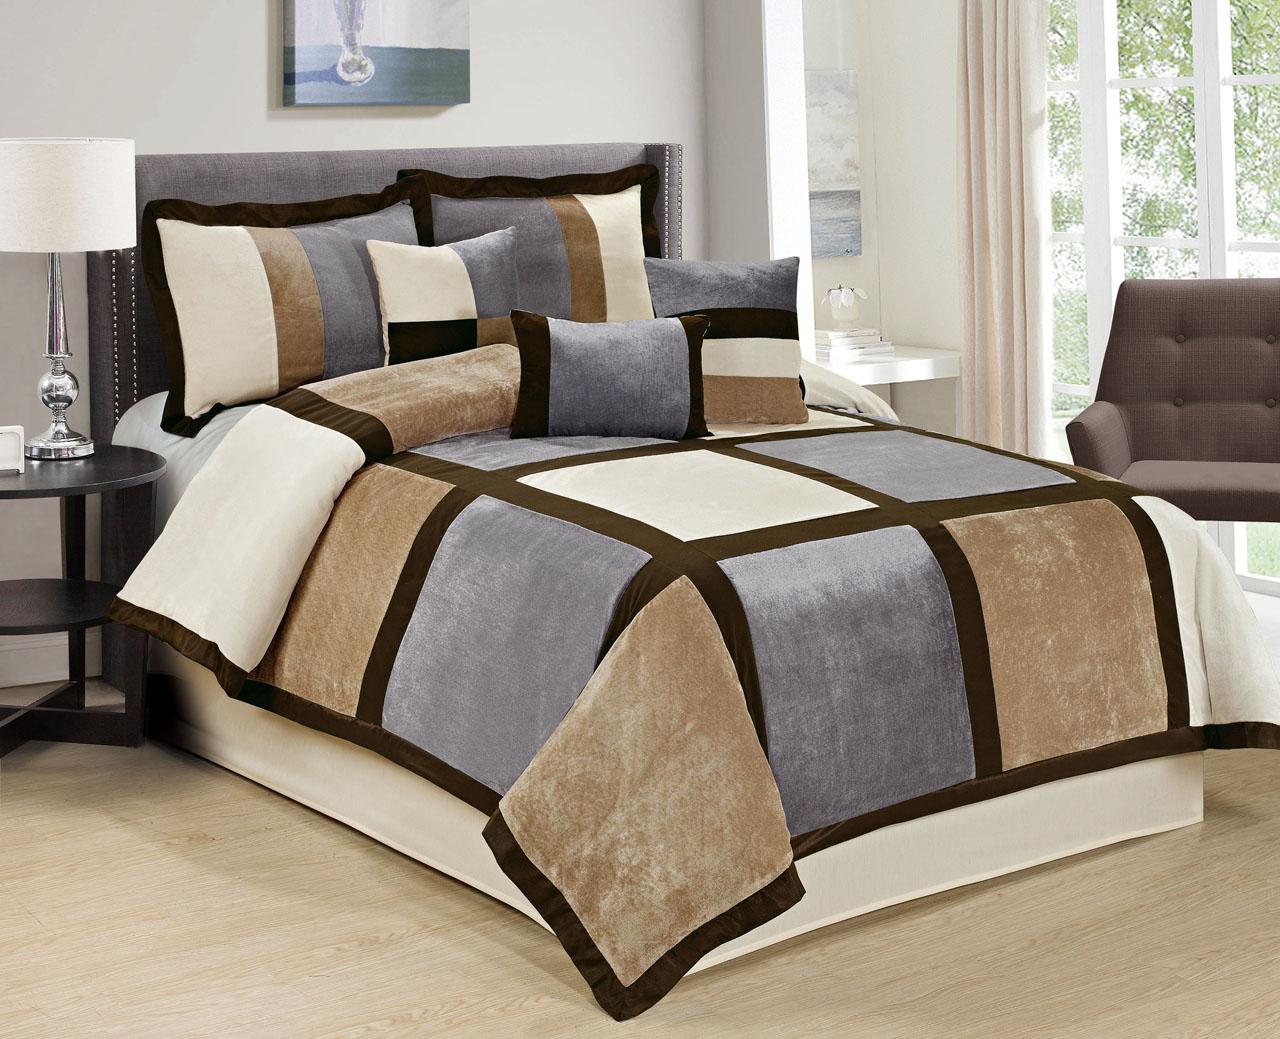 KingLinen 7 Piece Brandy Patchwork Micro Suede Gray/Taupe Comforter Set